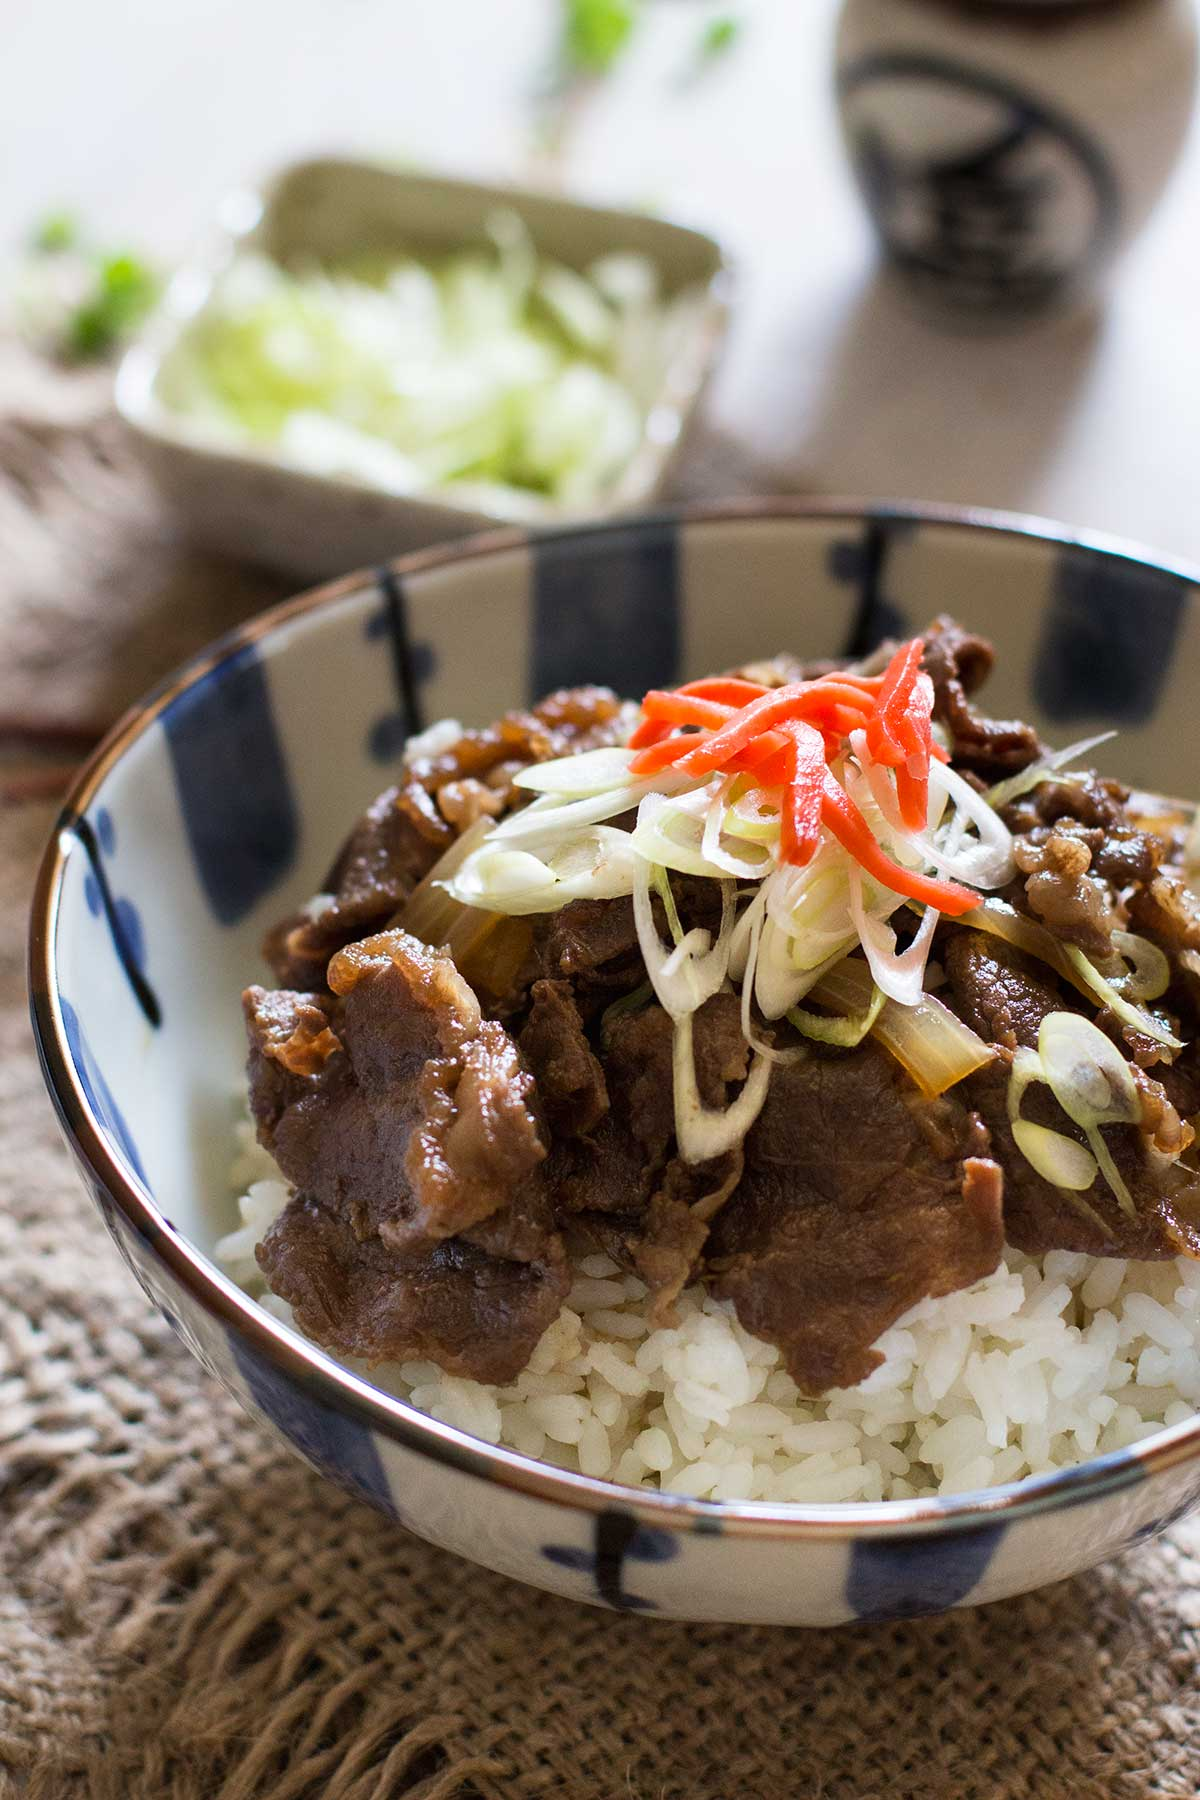 Gyudon Japanese Beef Bowls 牛丼 | Chopstick Chronicles